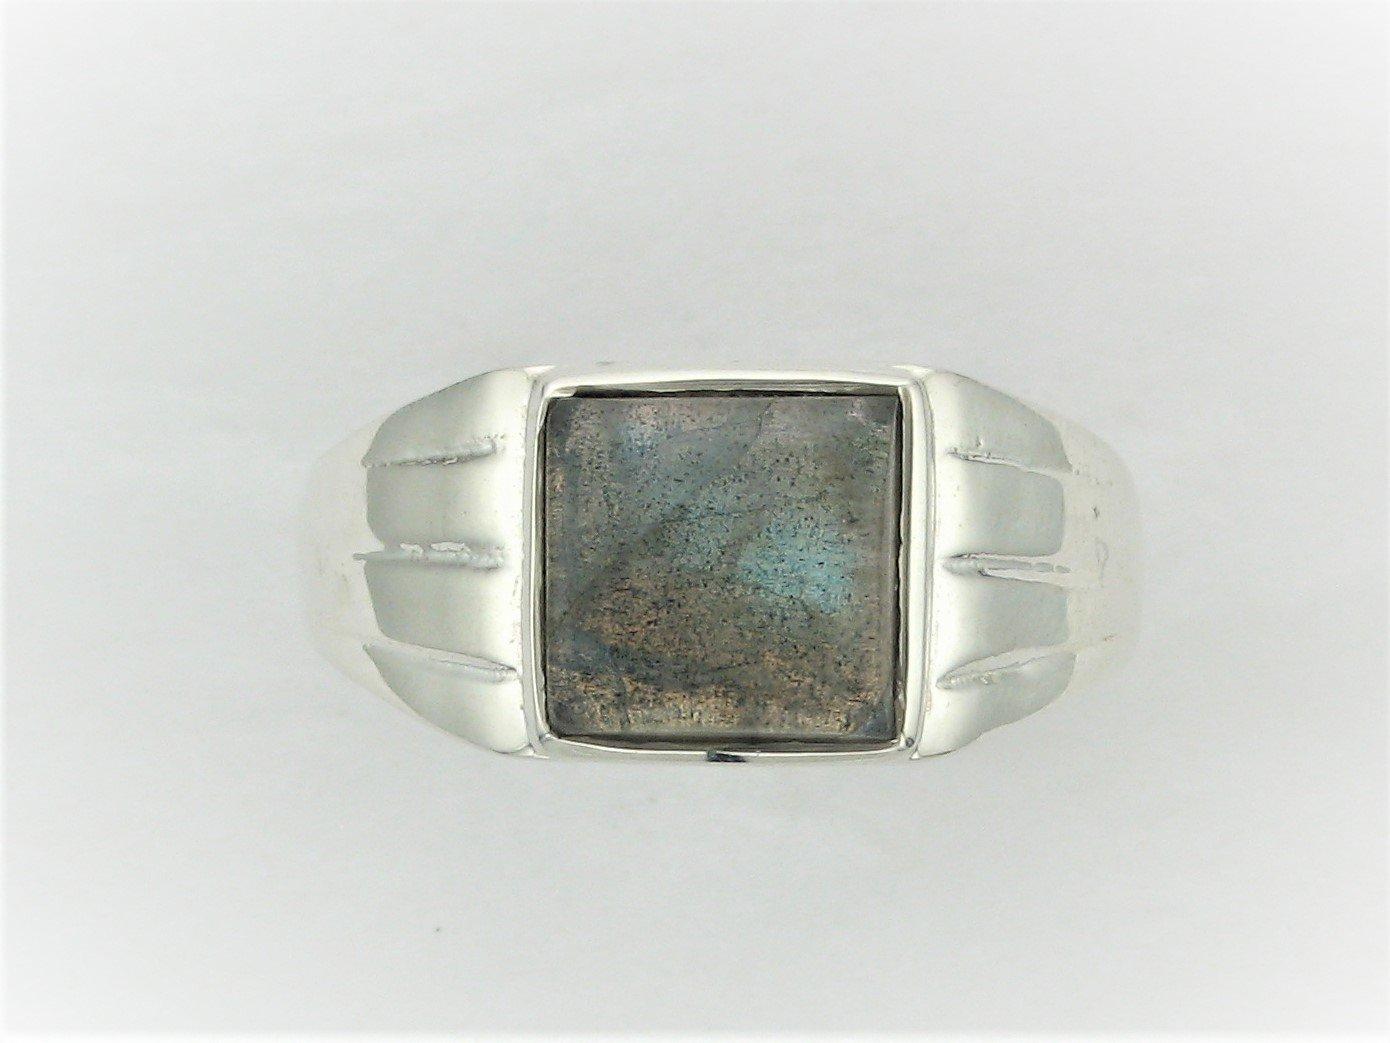 Square Labradorite Ring Set in Sterling Silver